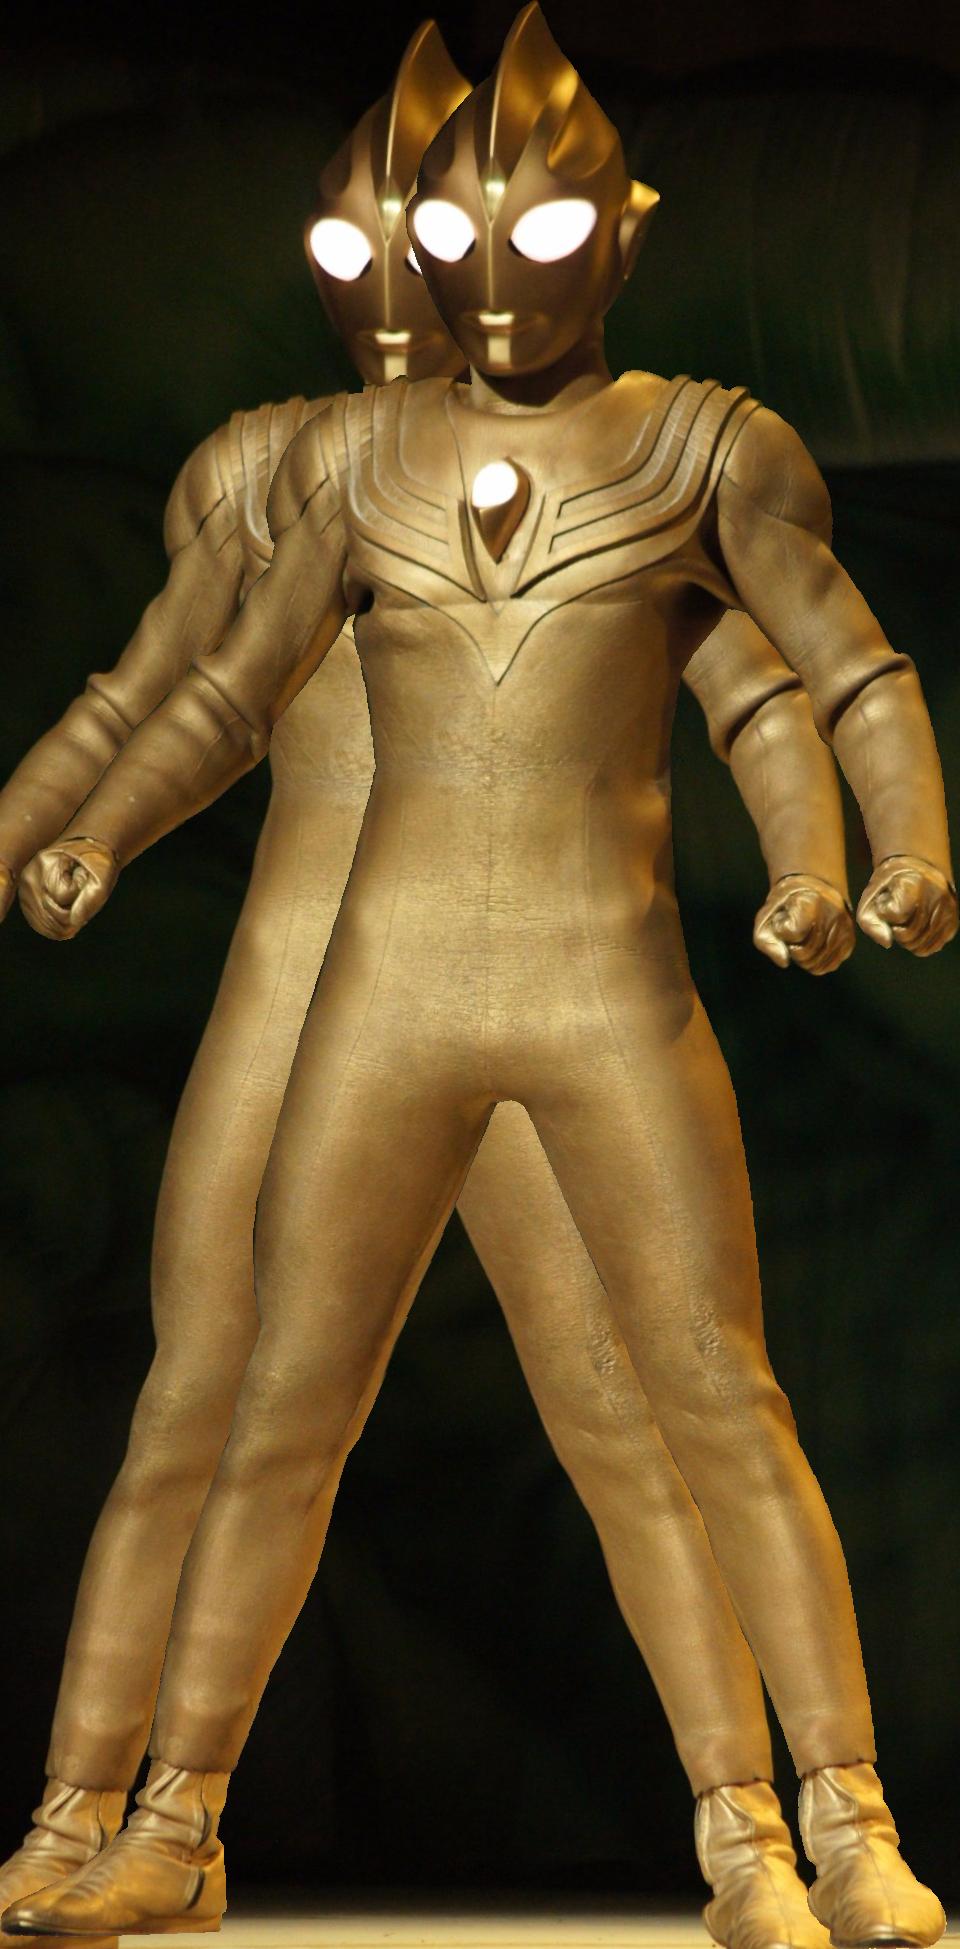 File:Ultraman Tiga Charecter Gritter.png